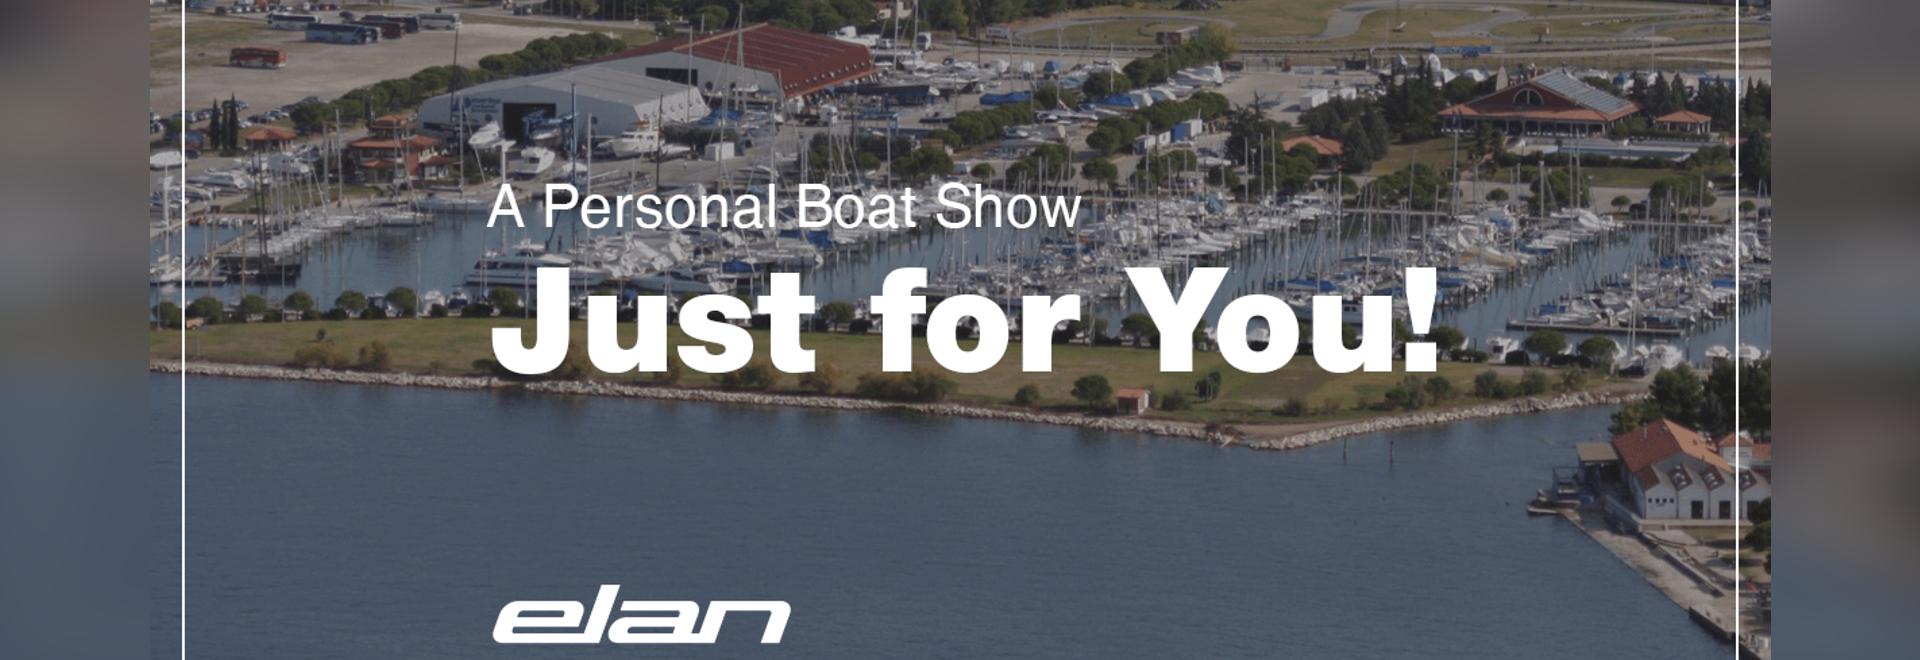 Elan Yachting Erfahrungszentrum